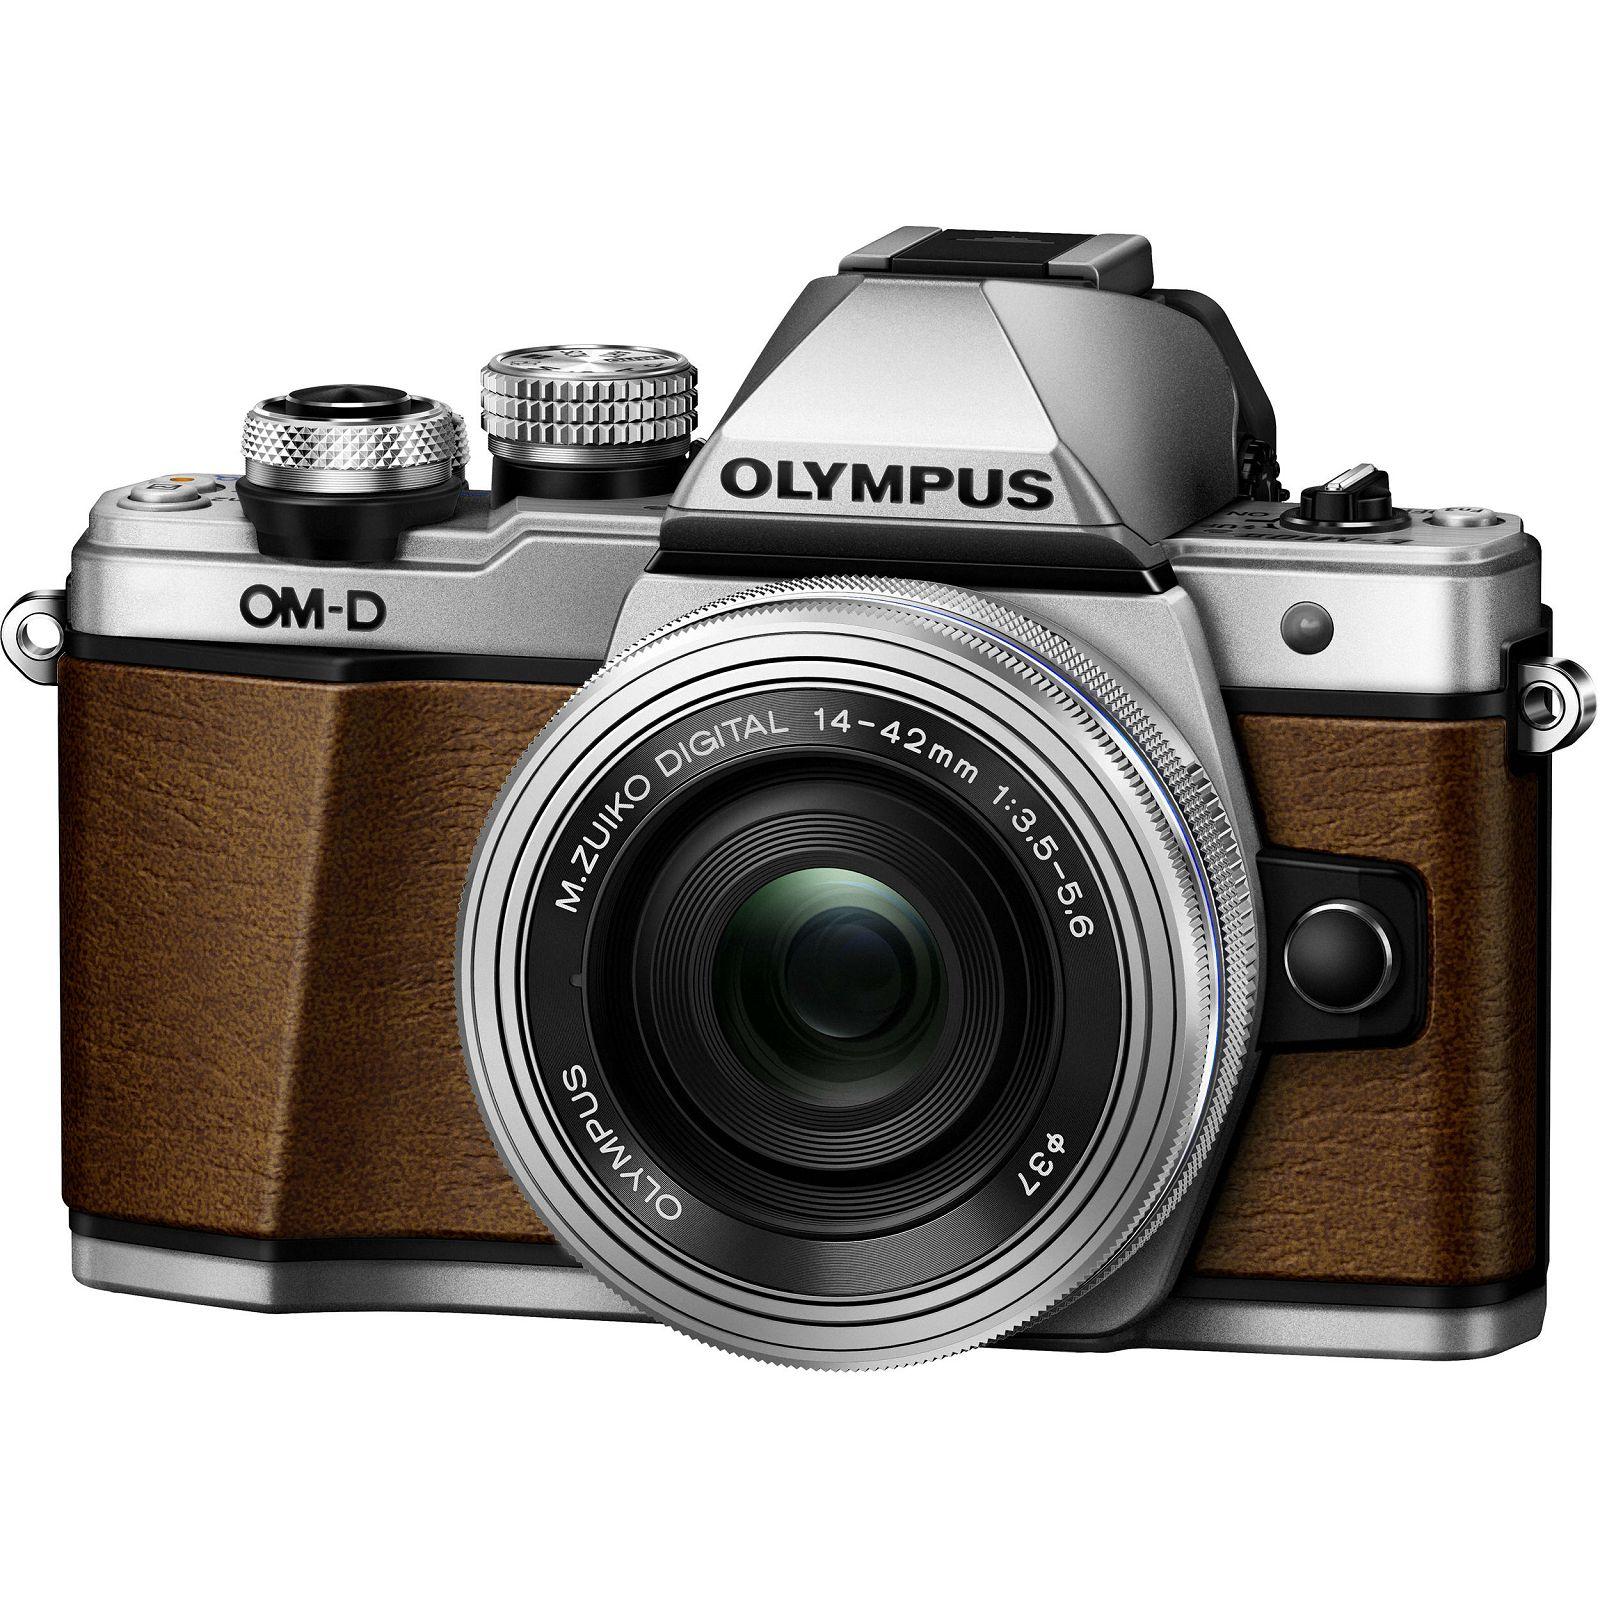 Olympus E-M10 II Body Fox Brown smeđi E-M10II Leather strap fox-brown, Silver lens cap,Charger, Rechargeable Battery, USB Cable, Video Cable & EZ-M1442 EZ fotoaparat V207056NE000